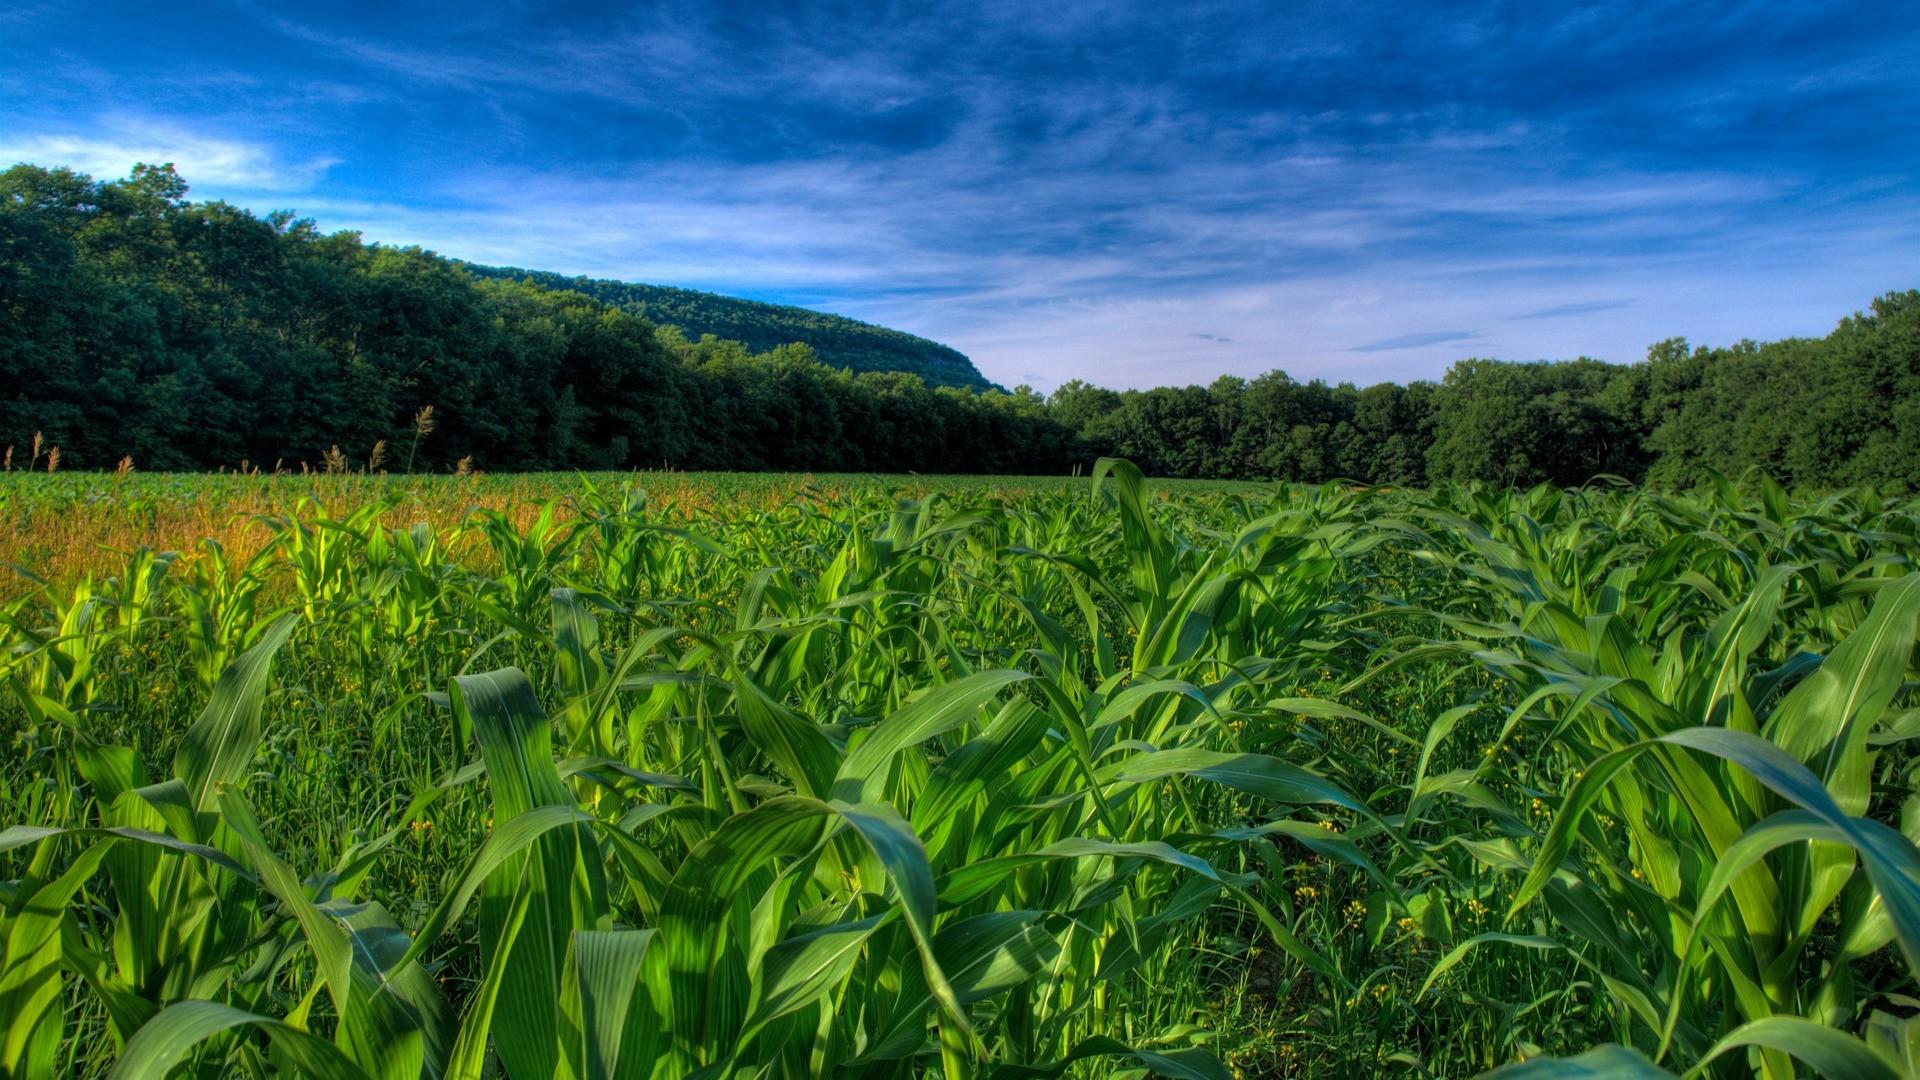 Corn Fields Wallpaper Plants Nature Wallpapers